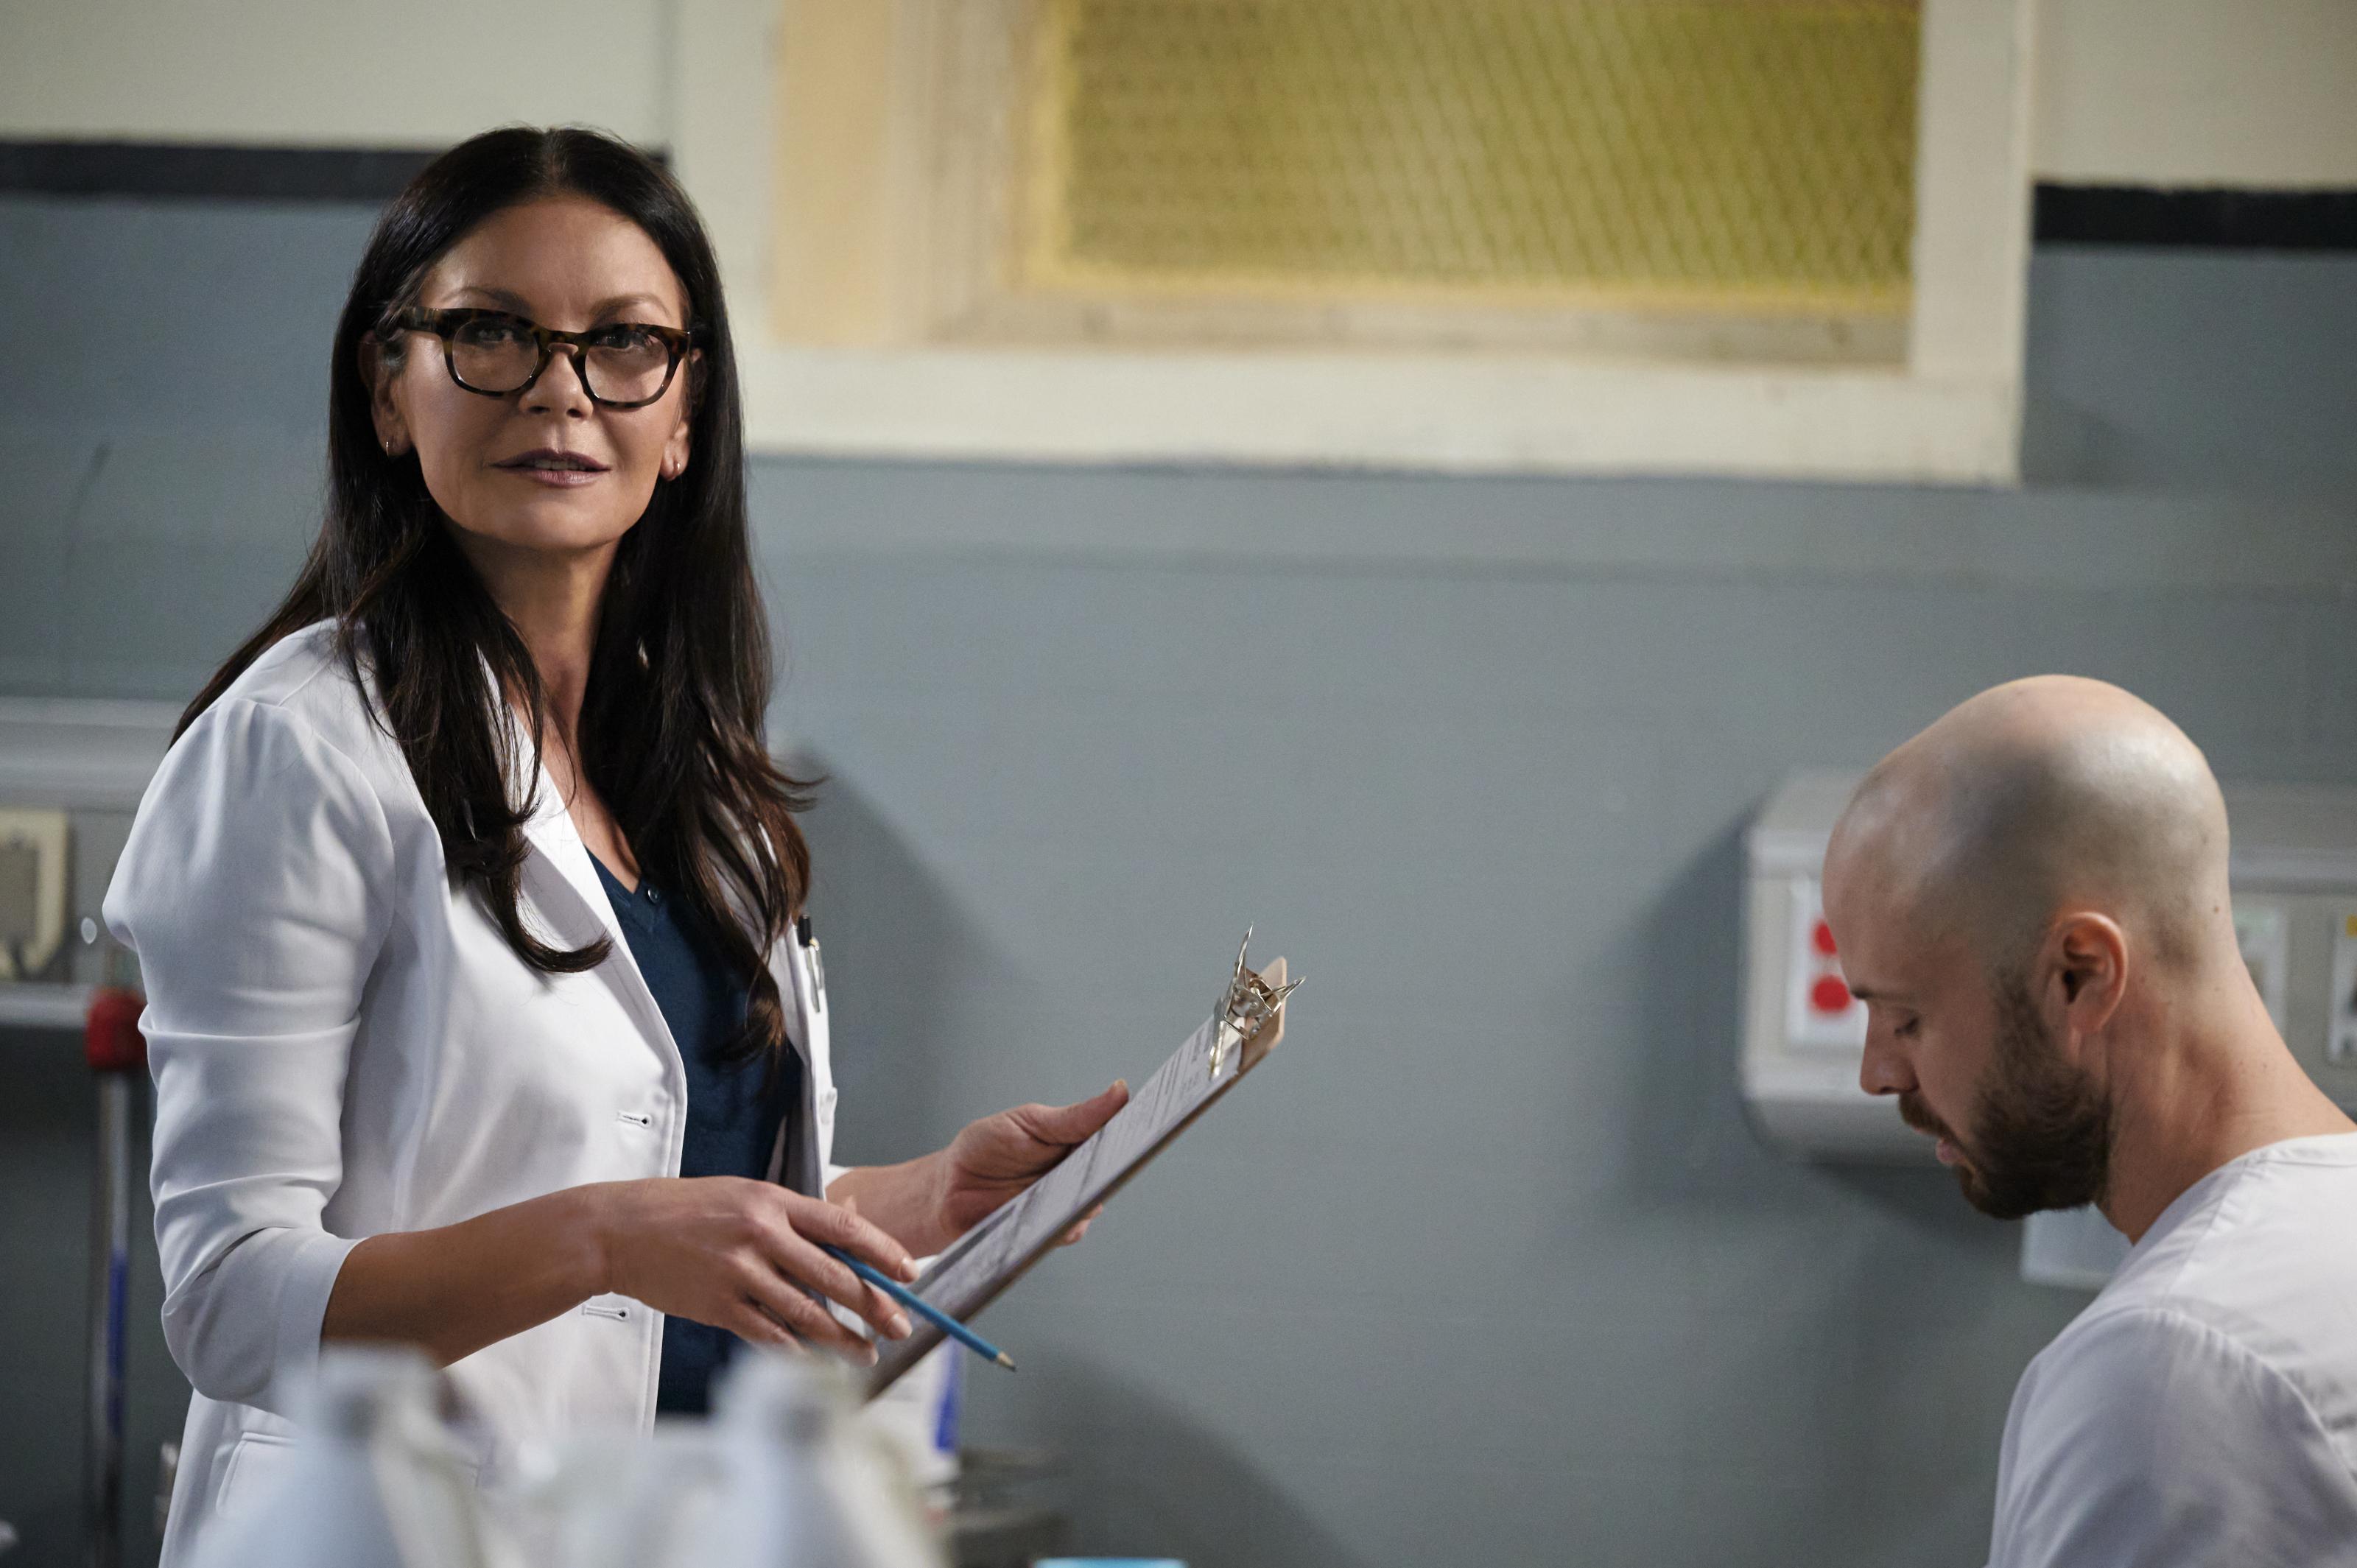 Prodigal Son Season 2, Episode 7 spoilers: Catherine Zeta-Jones's debut